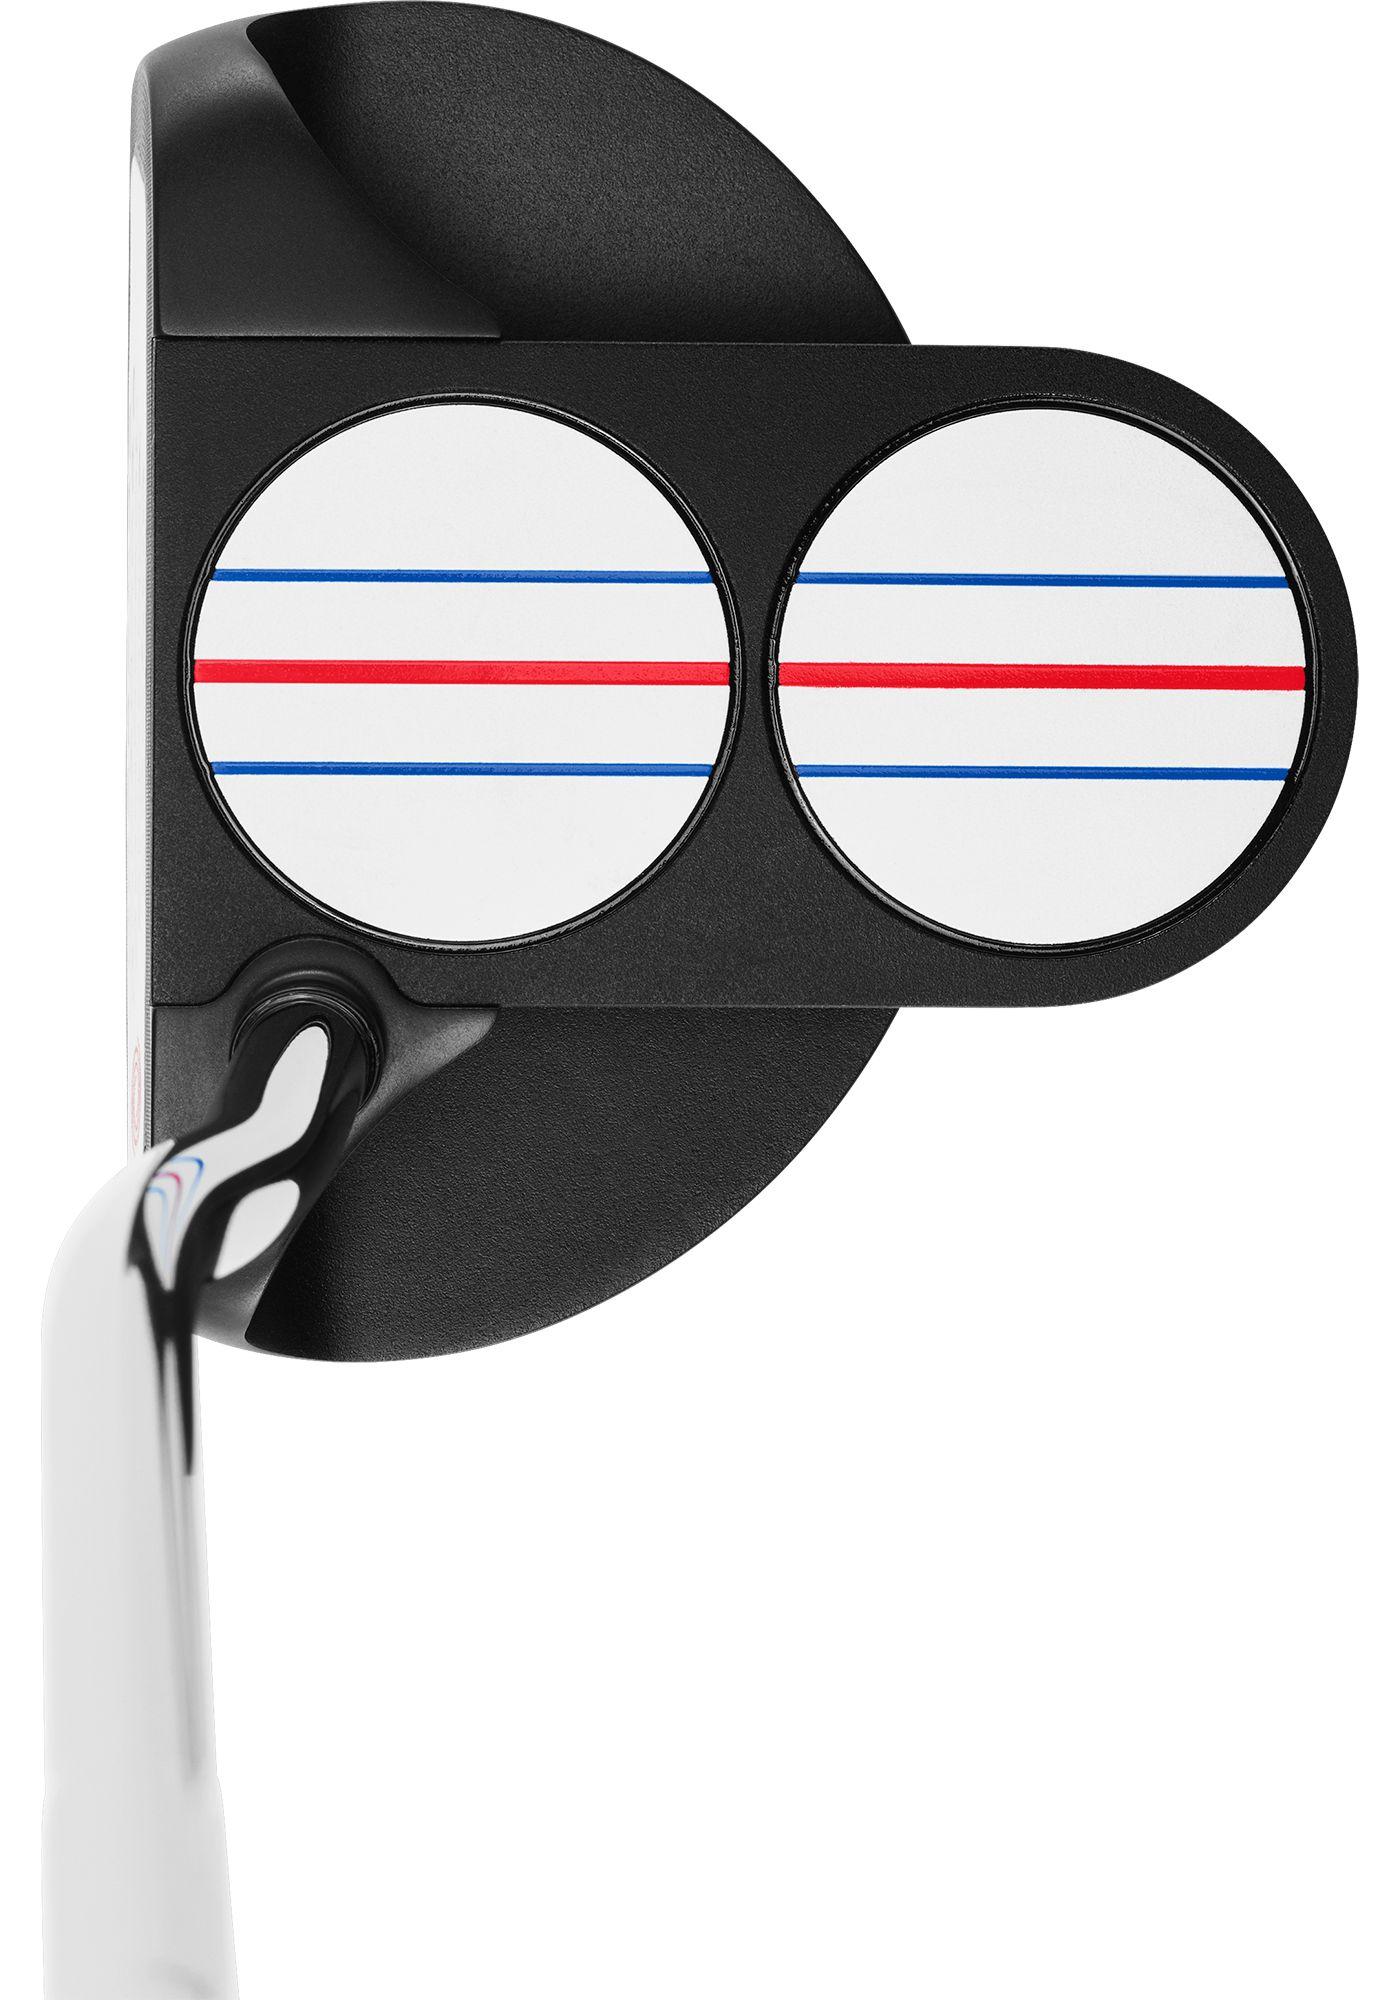 Odyssey Triple Track Custom Putter